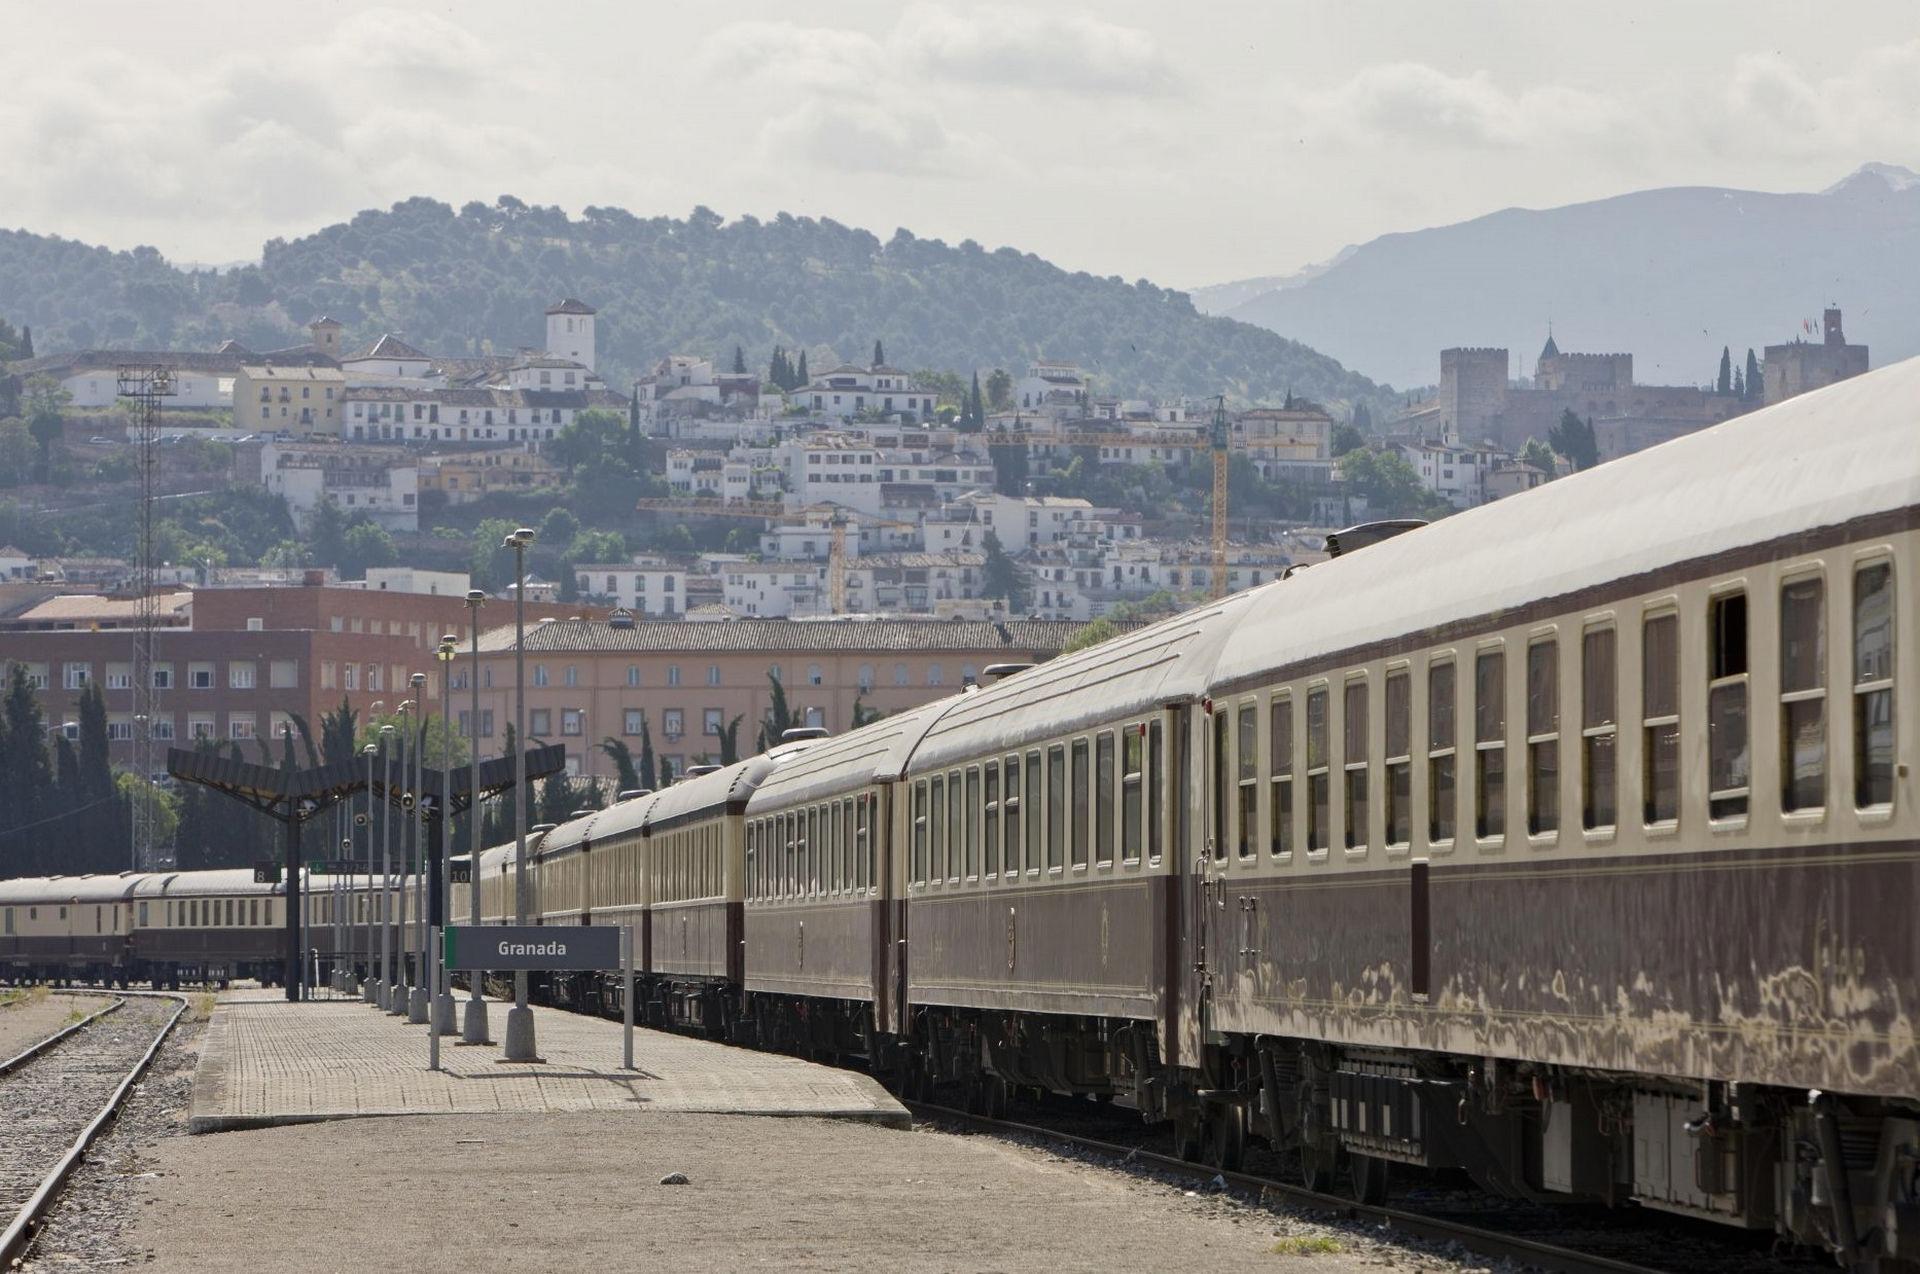 NOMAD-luksusowe-pociągi-w-Hiszpani-Al-Andalus-12